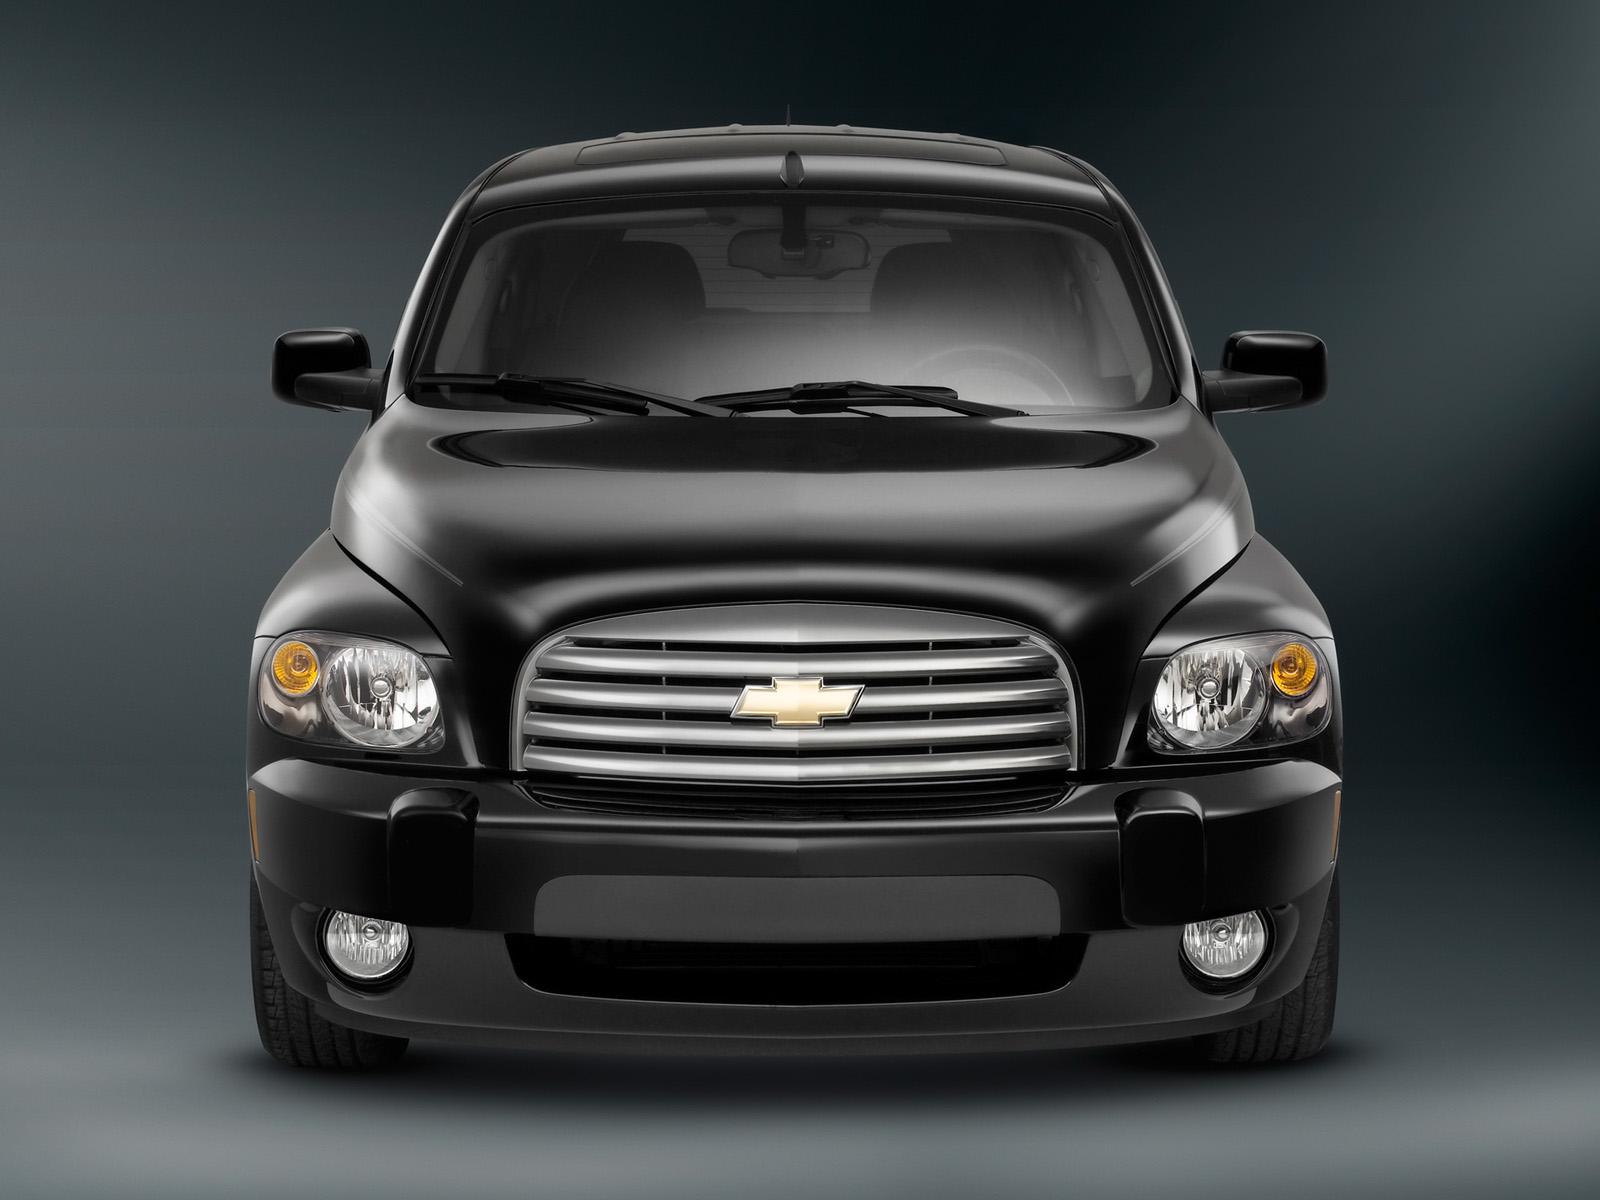 2007-Chevy-HHR-Fall-Limited-Edition-F-1600x1200-1-